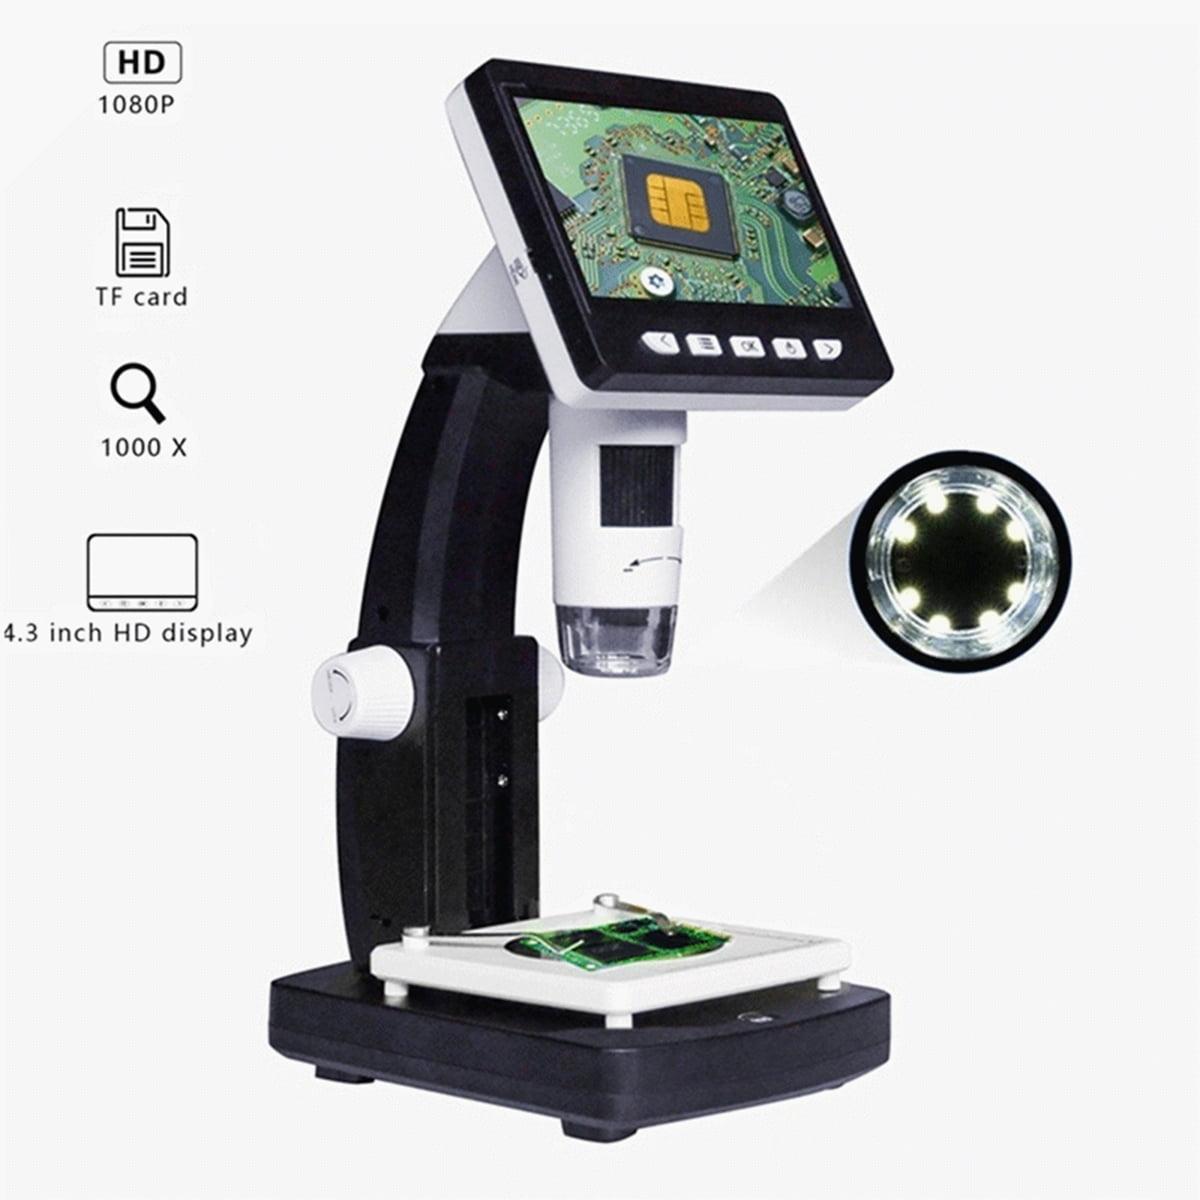 G710 1000X 4.3 inches HD 1080P Portable Desktop LCD Digital Microscope 2048*1536 Resolution